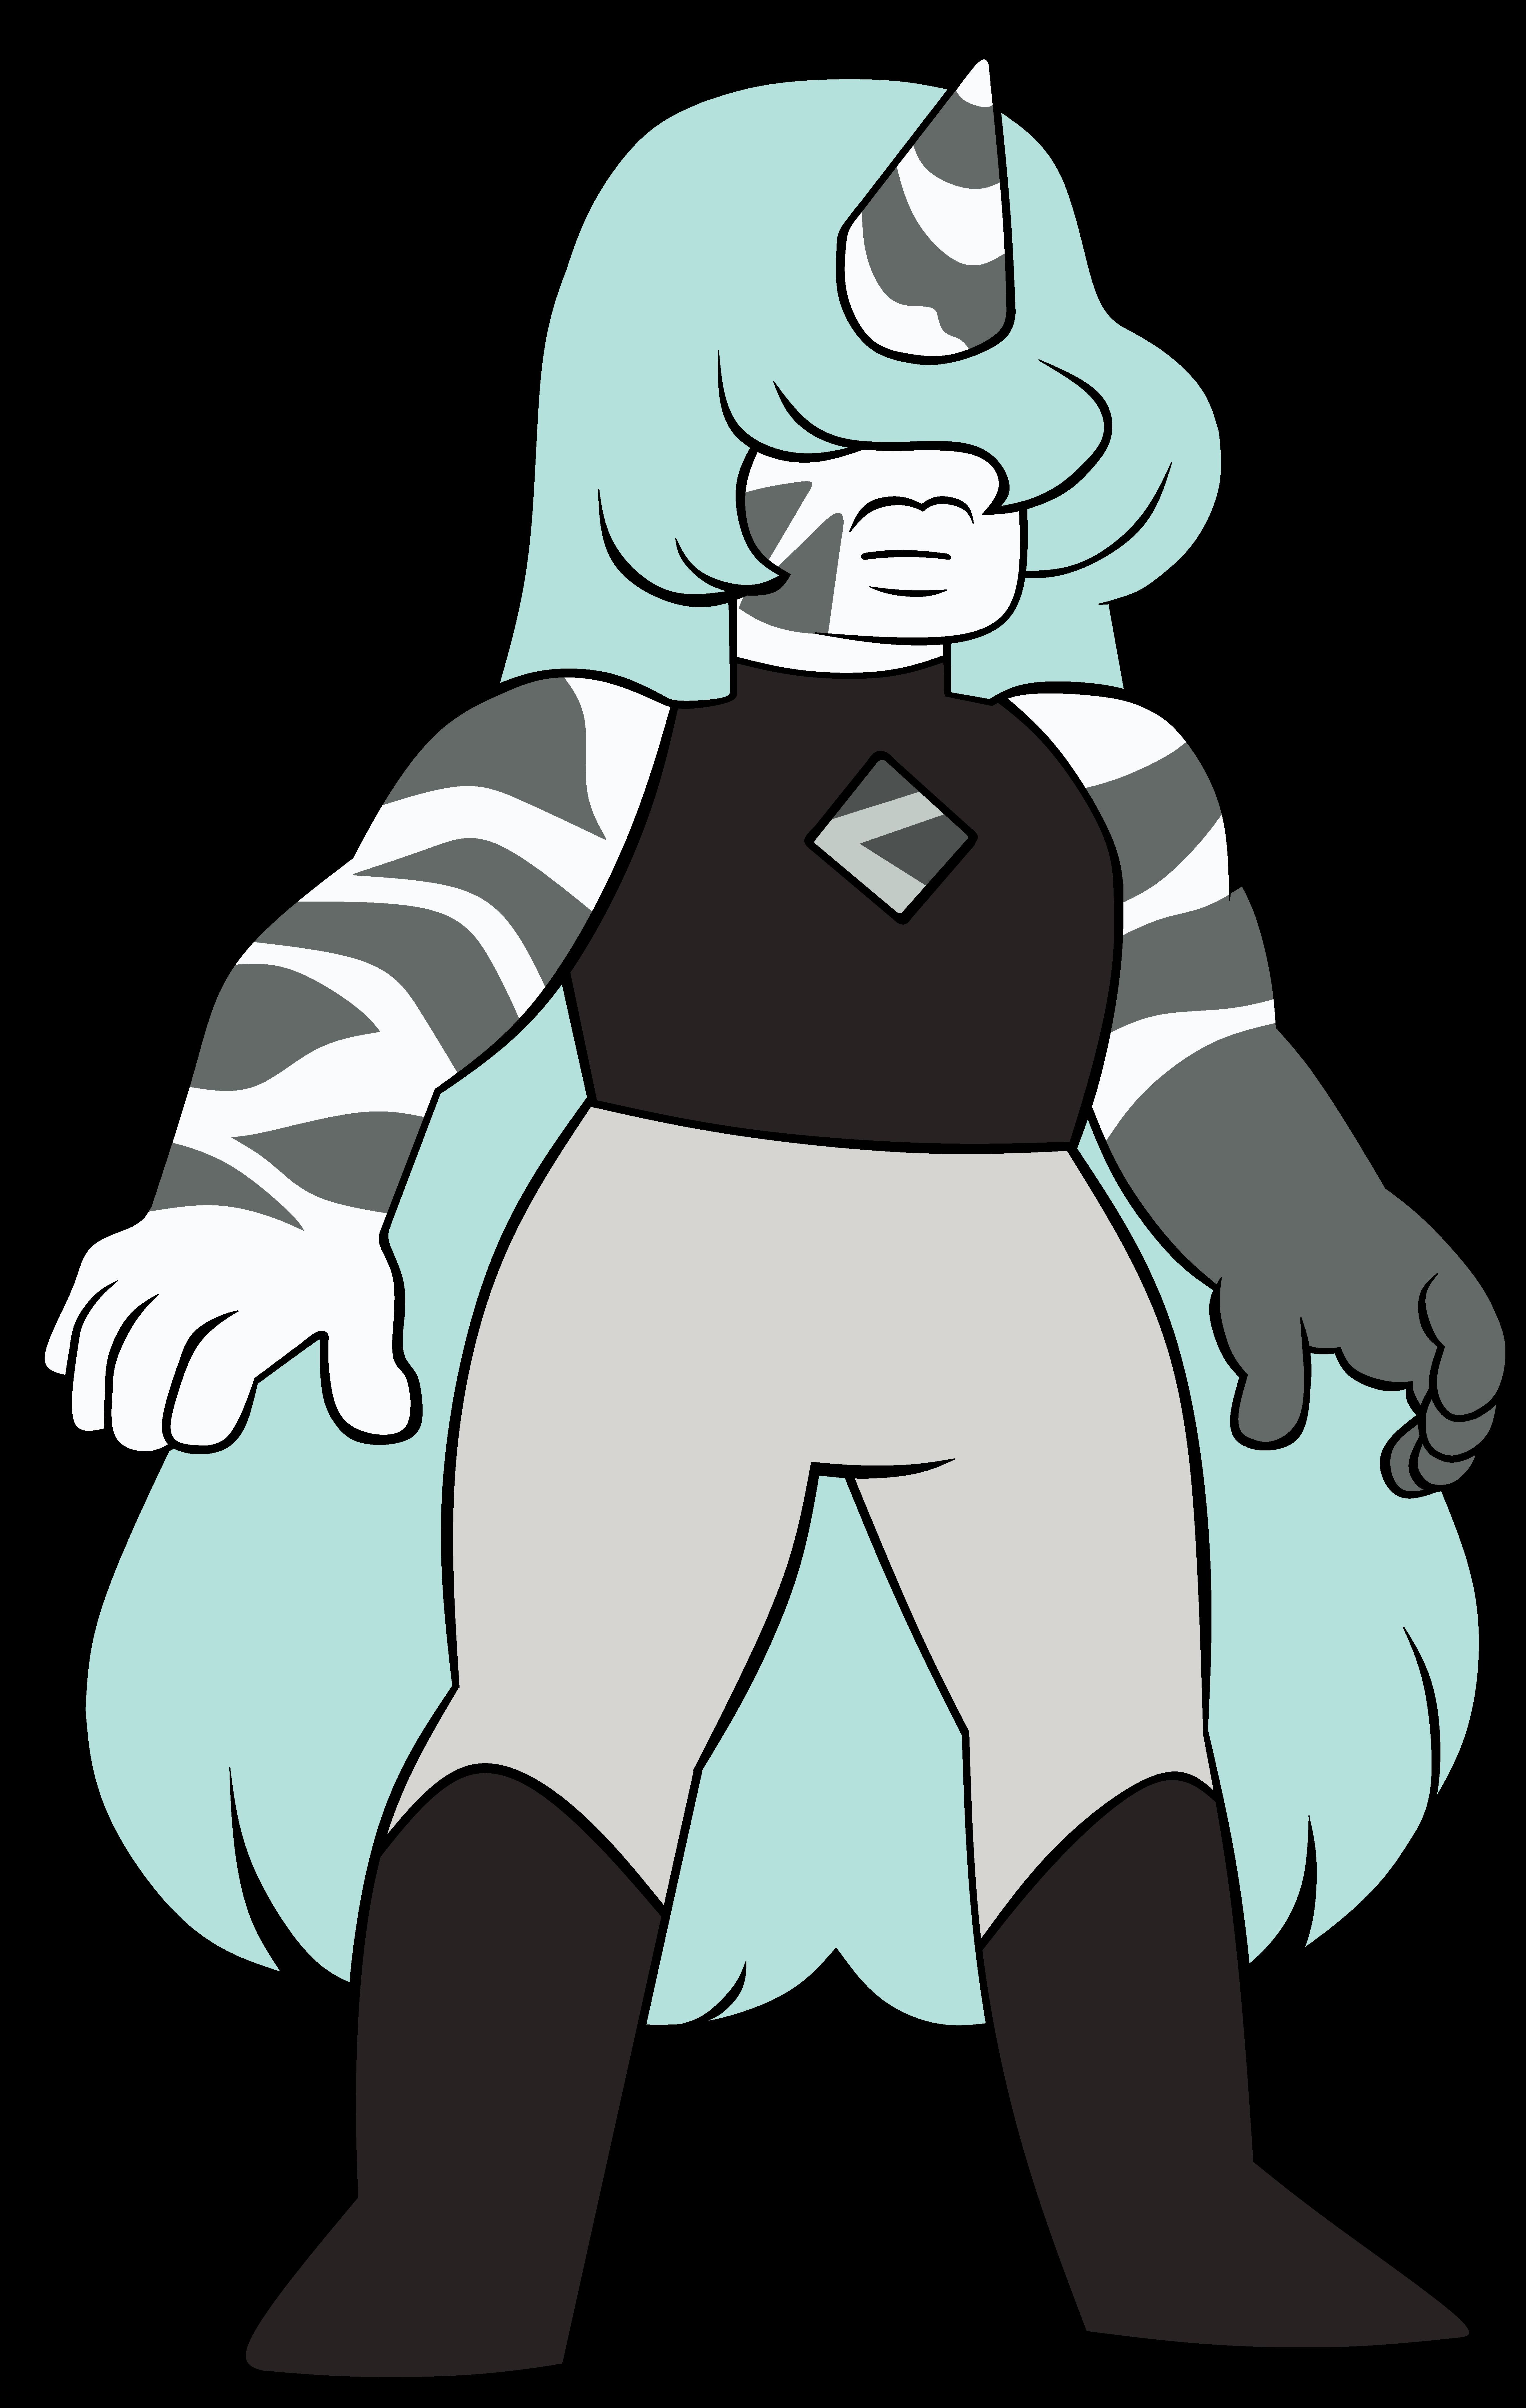 Jasper Zebra (Singular)